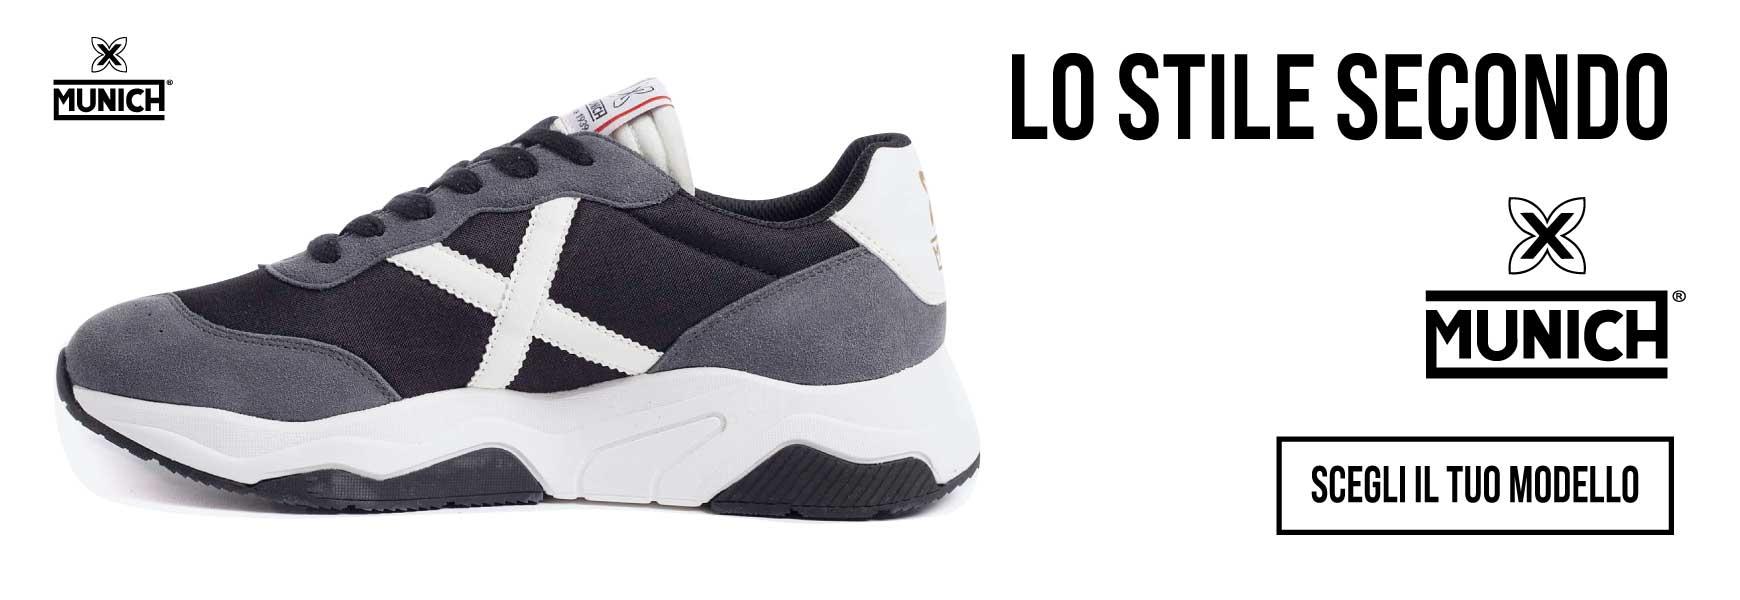 Adidas Stan Smith Acquista Ora - Alfieri Sport